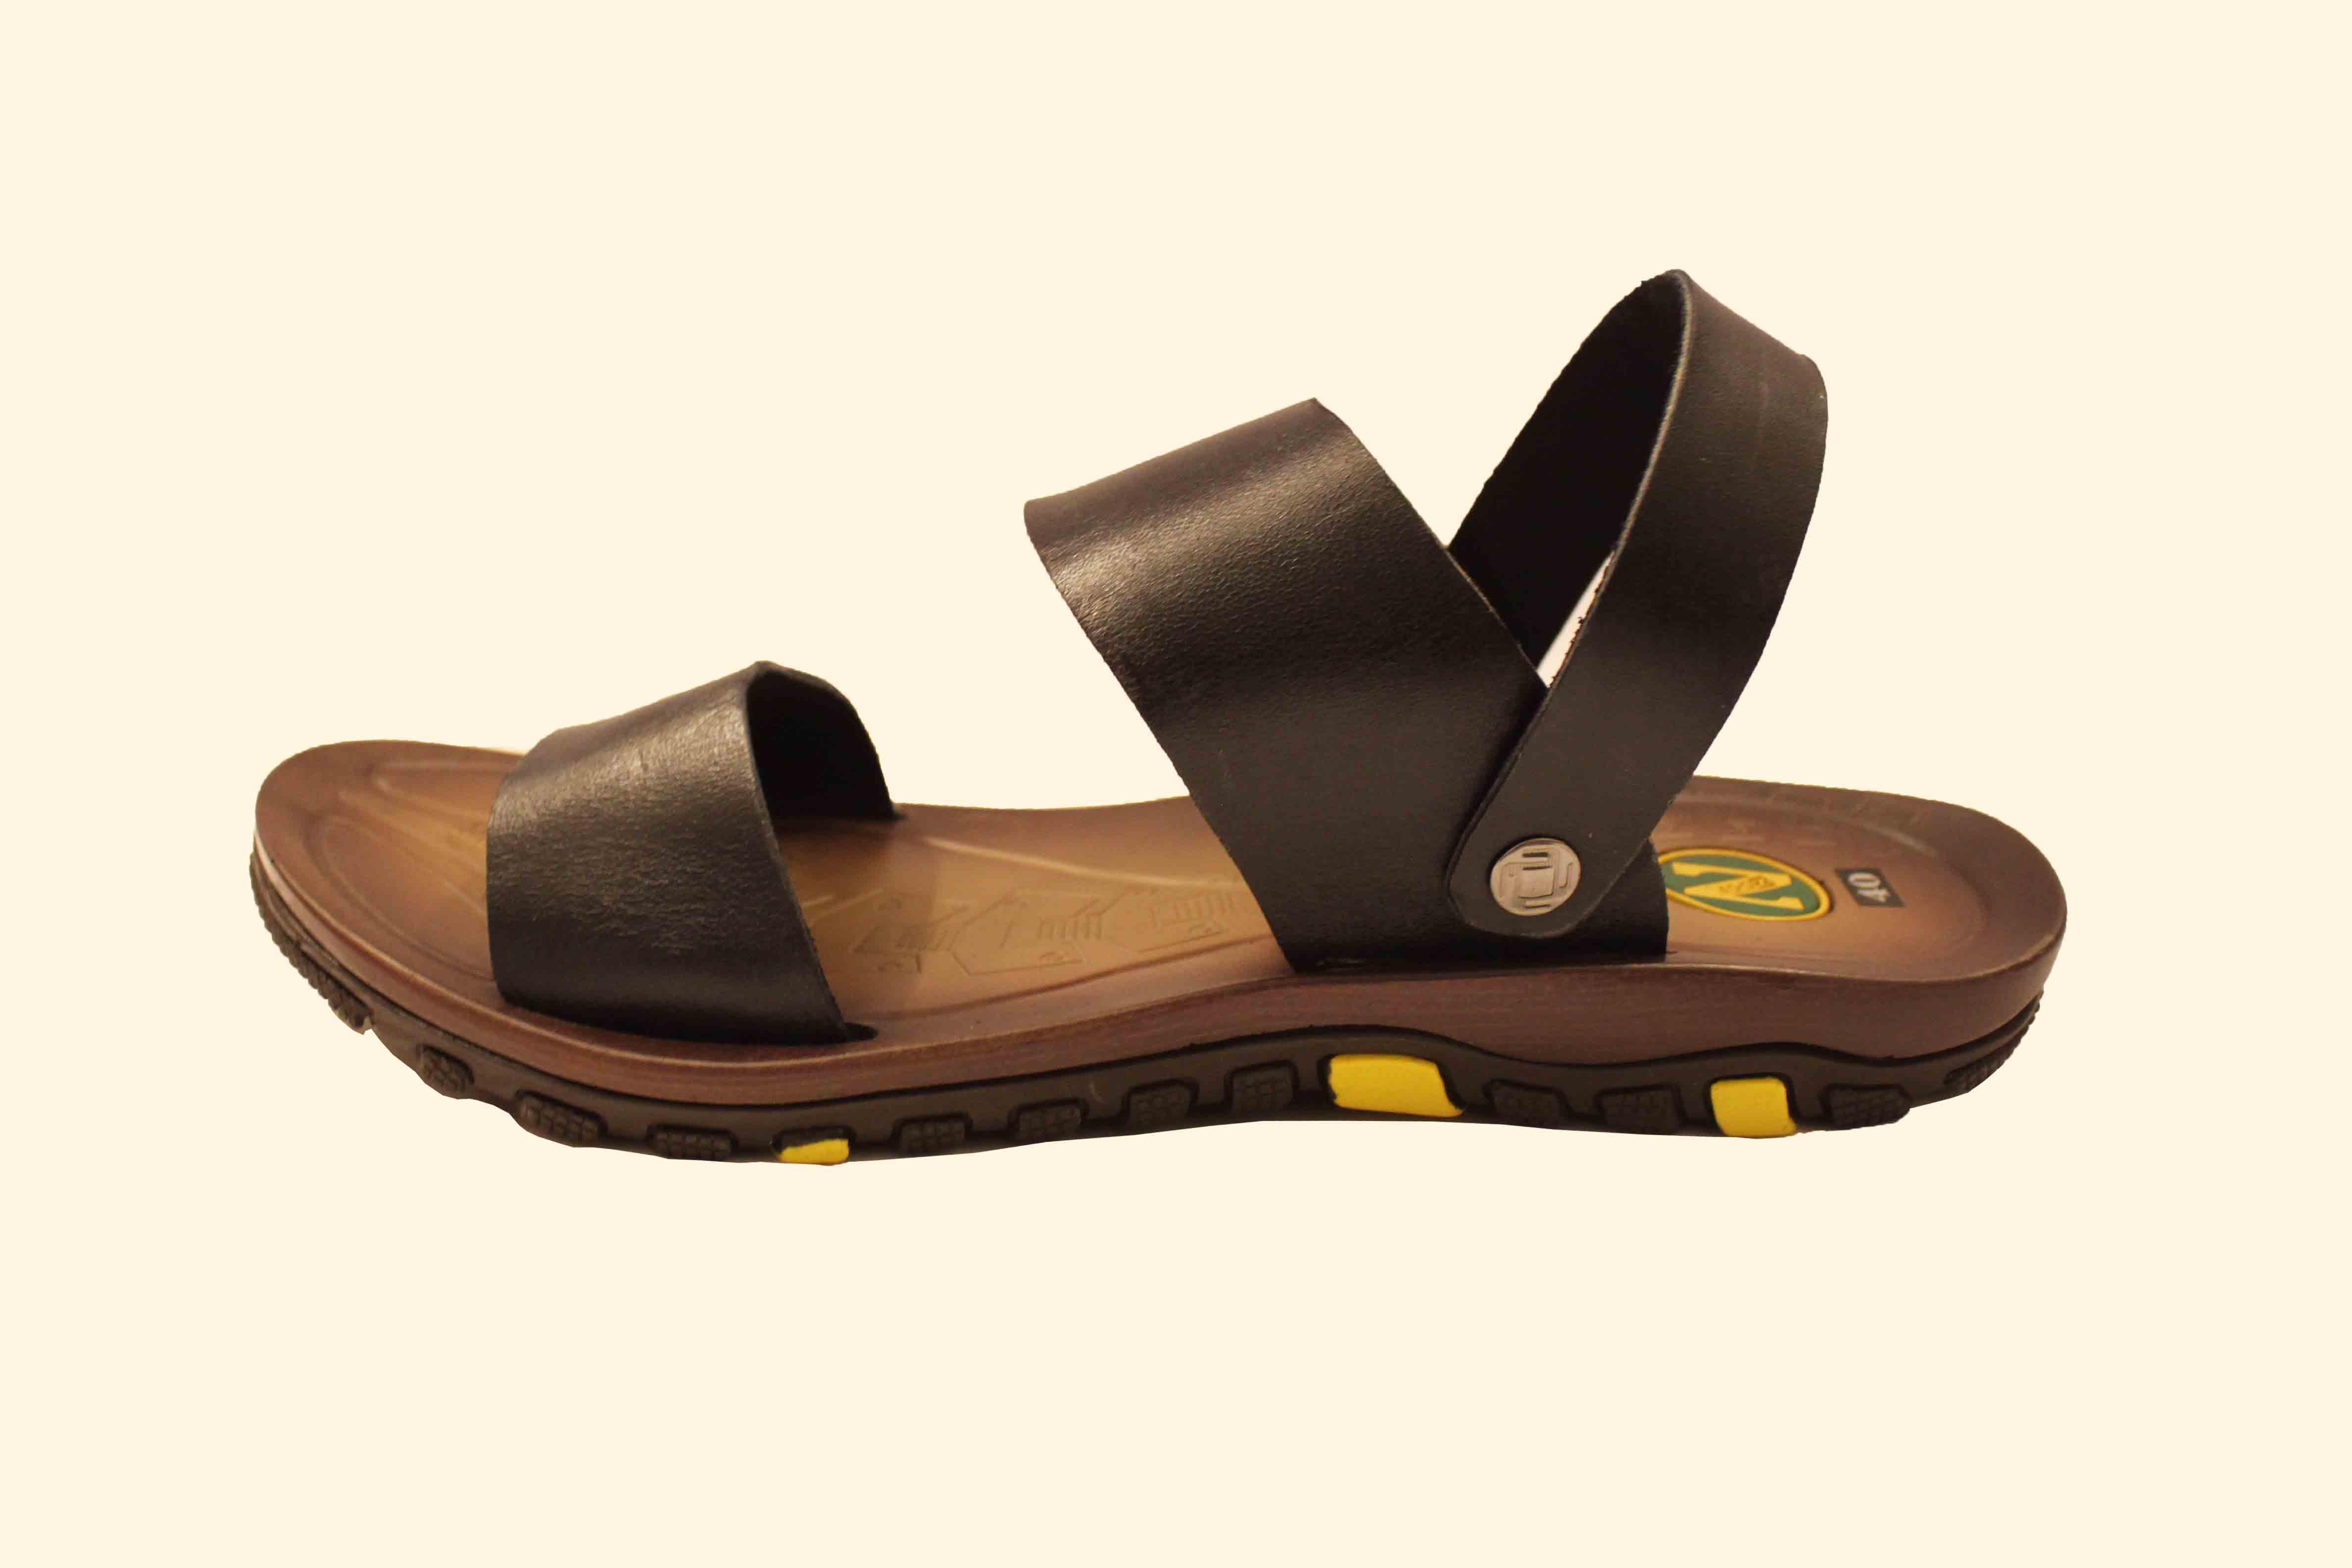 sandal nam da that